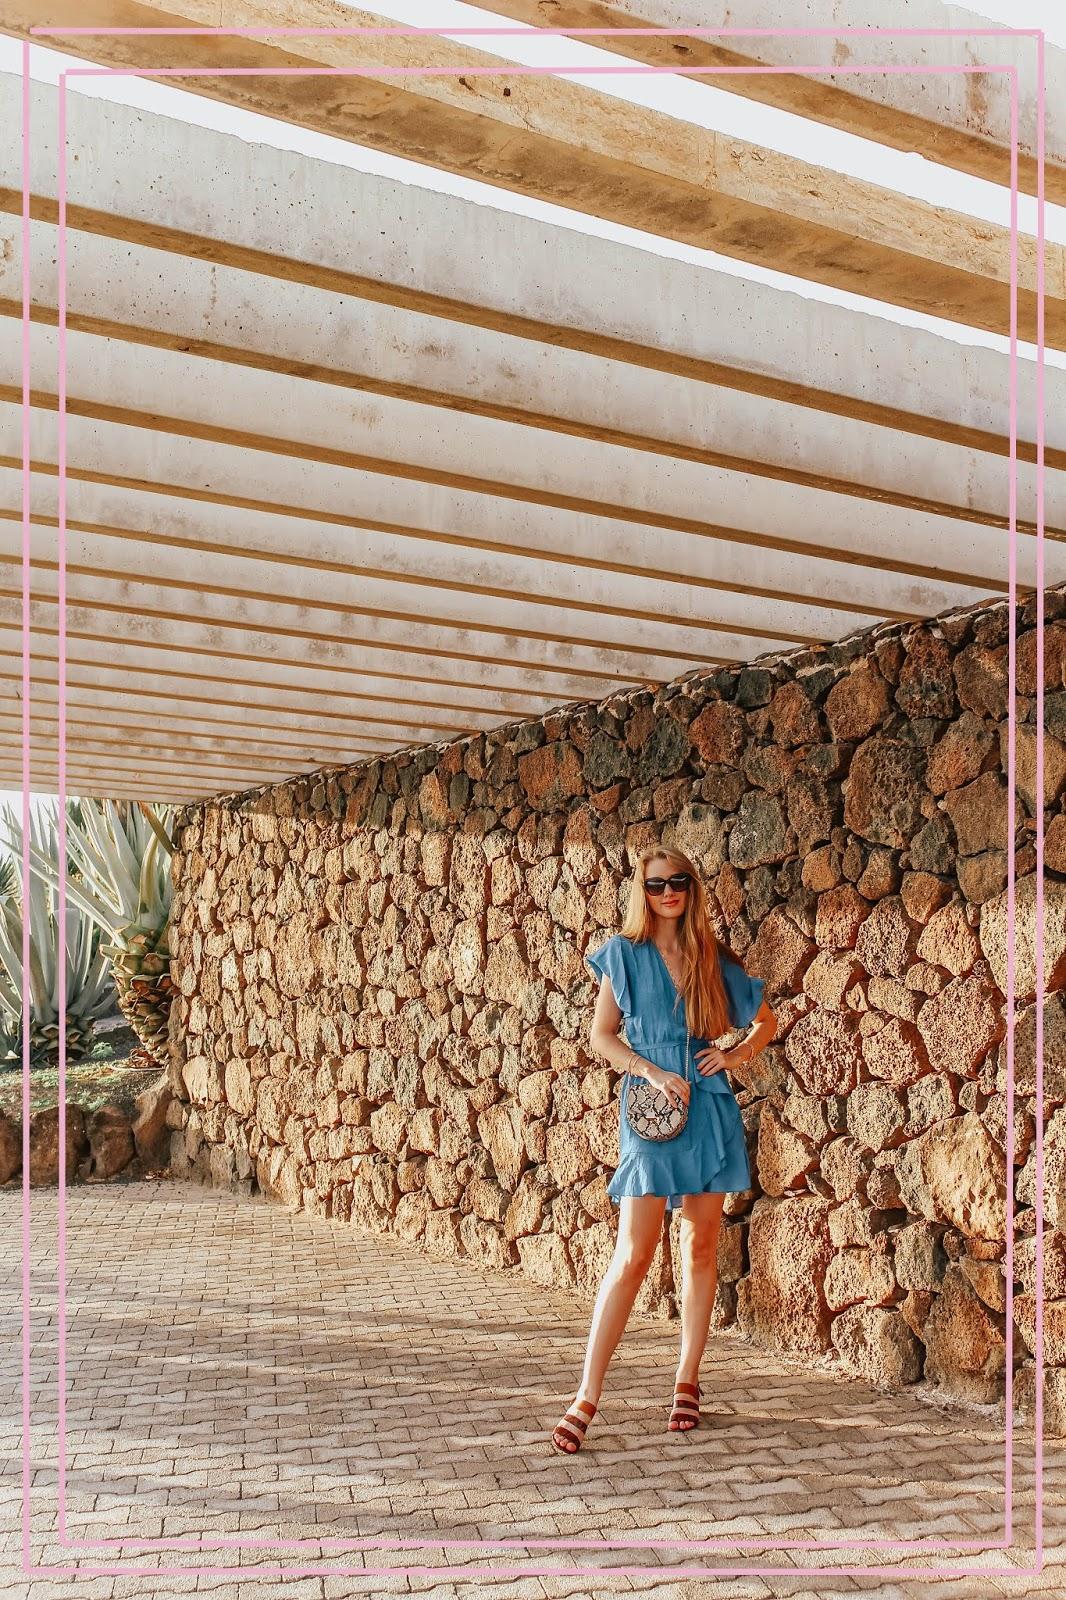 Lanzarote Playa Blanca Luxury Travel Blog Review